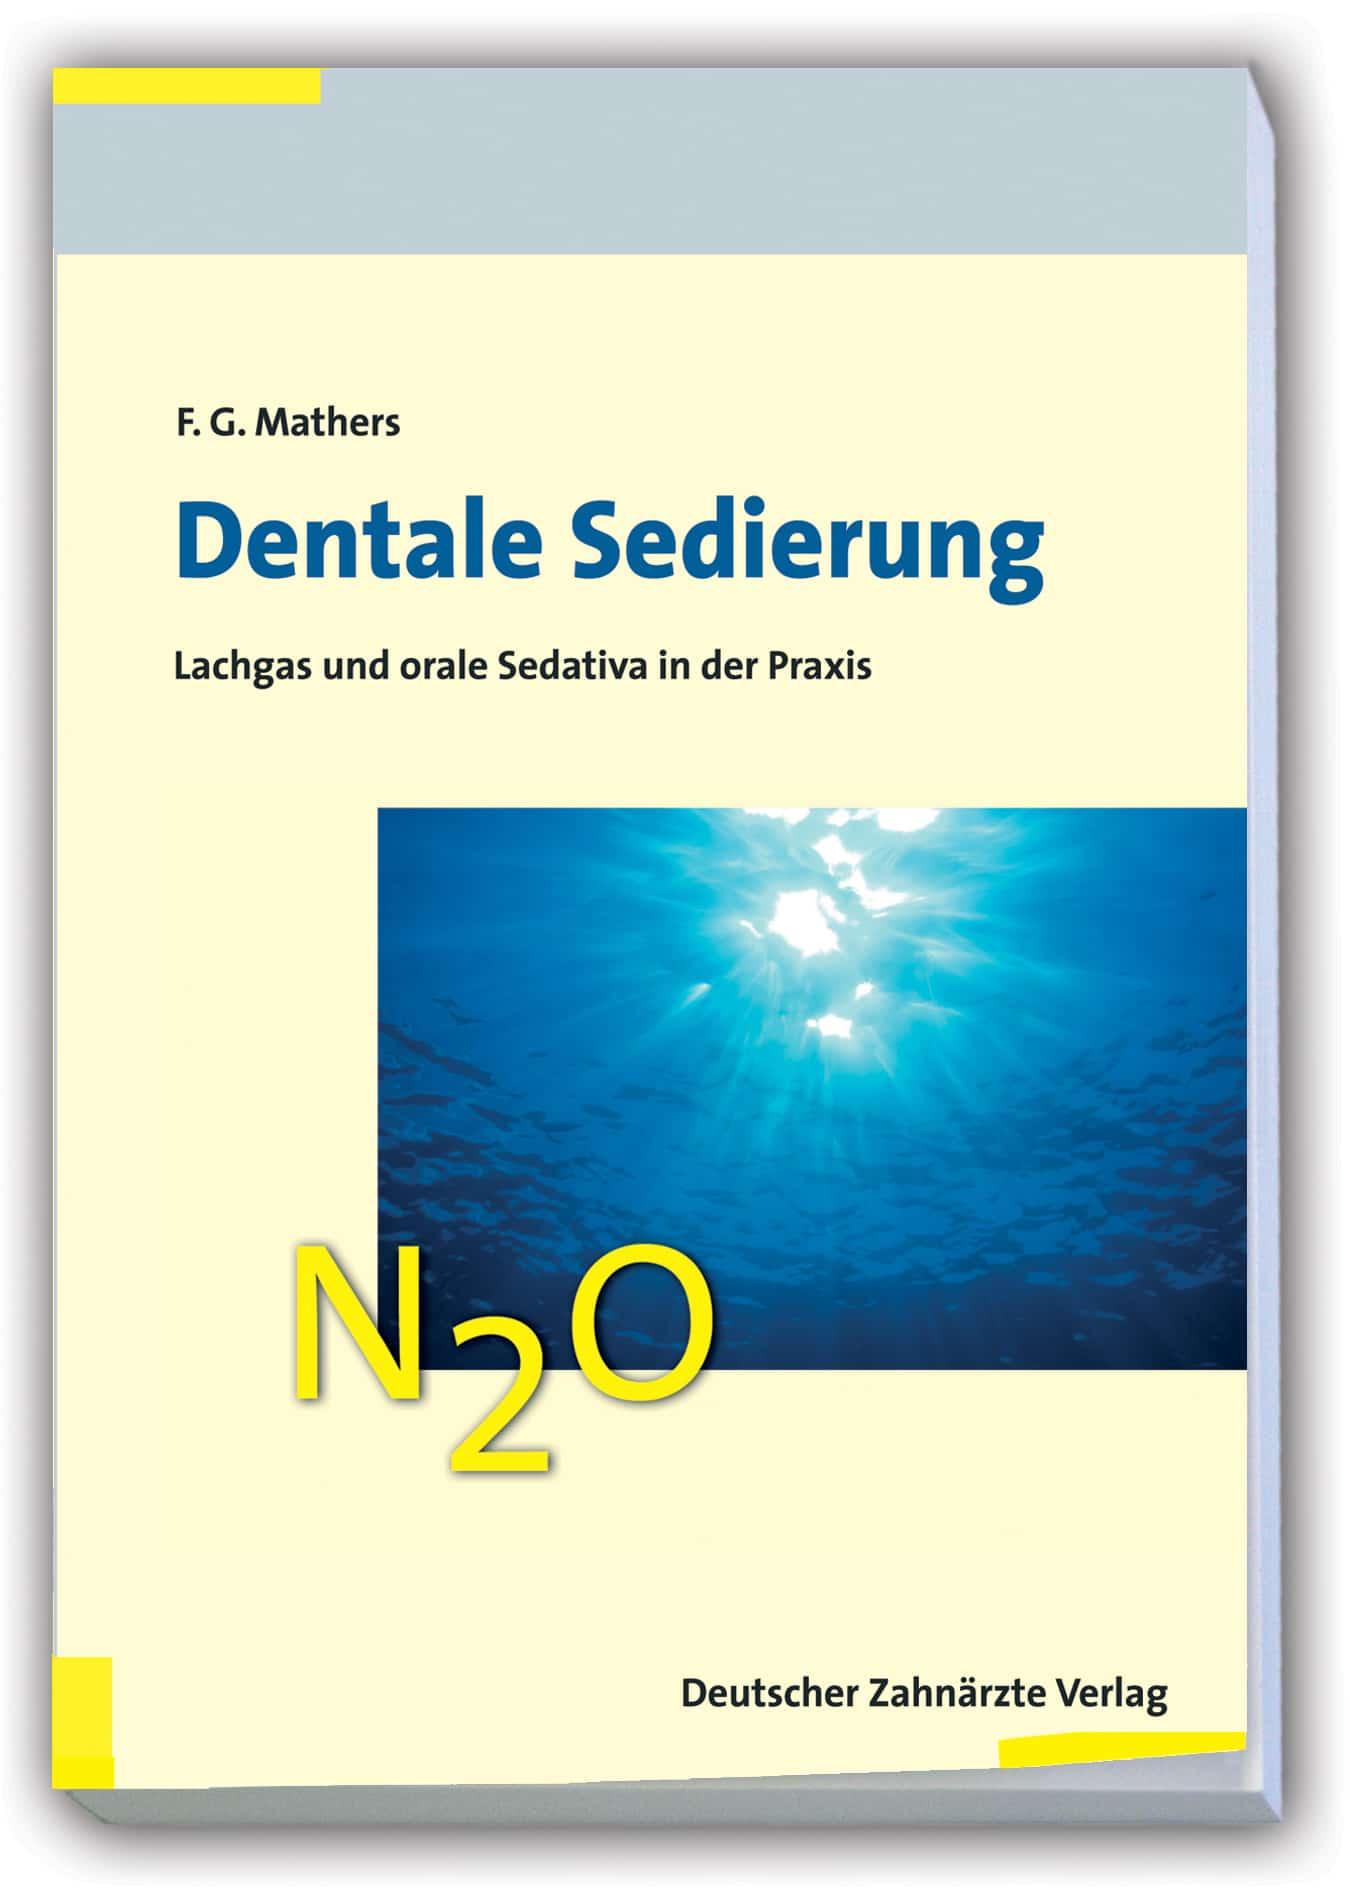 Dr. Frank G. Mathers, Fachbuch Dentale Sedierung, Lachgas, Orale Sedativa